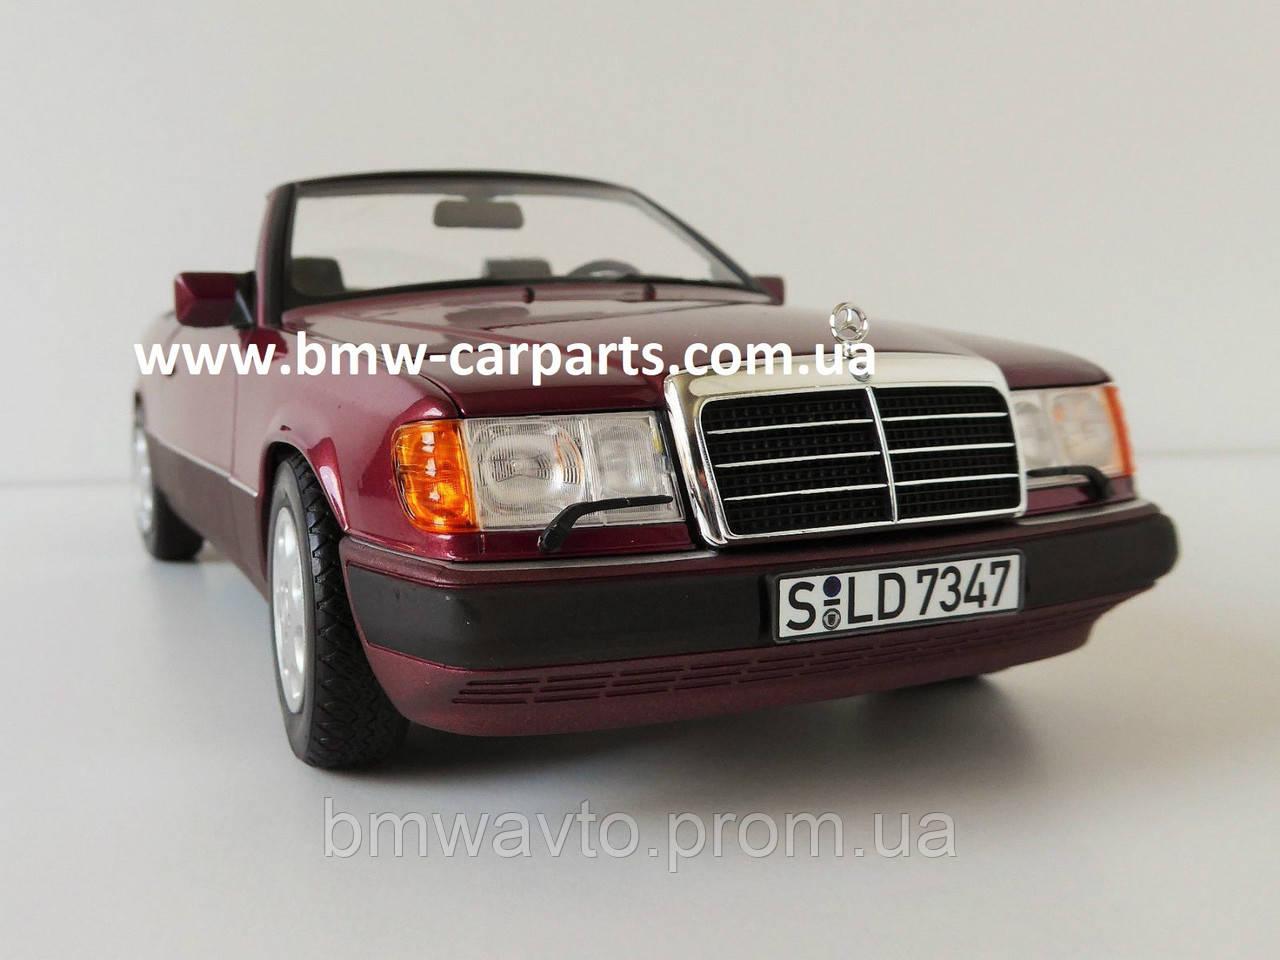 Модель Mercedes-Benz 300 CE-24 Cabriolet A124 1:18 Scale